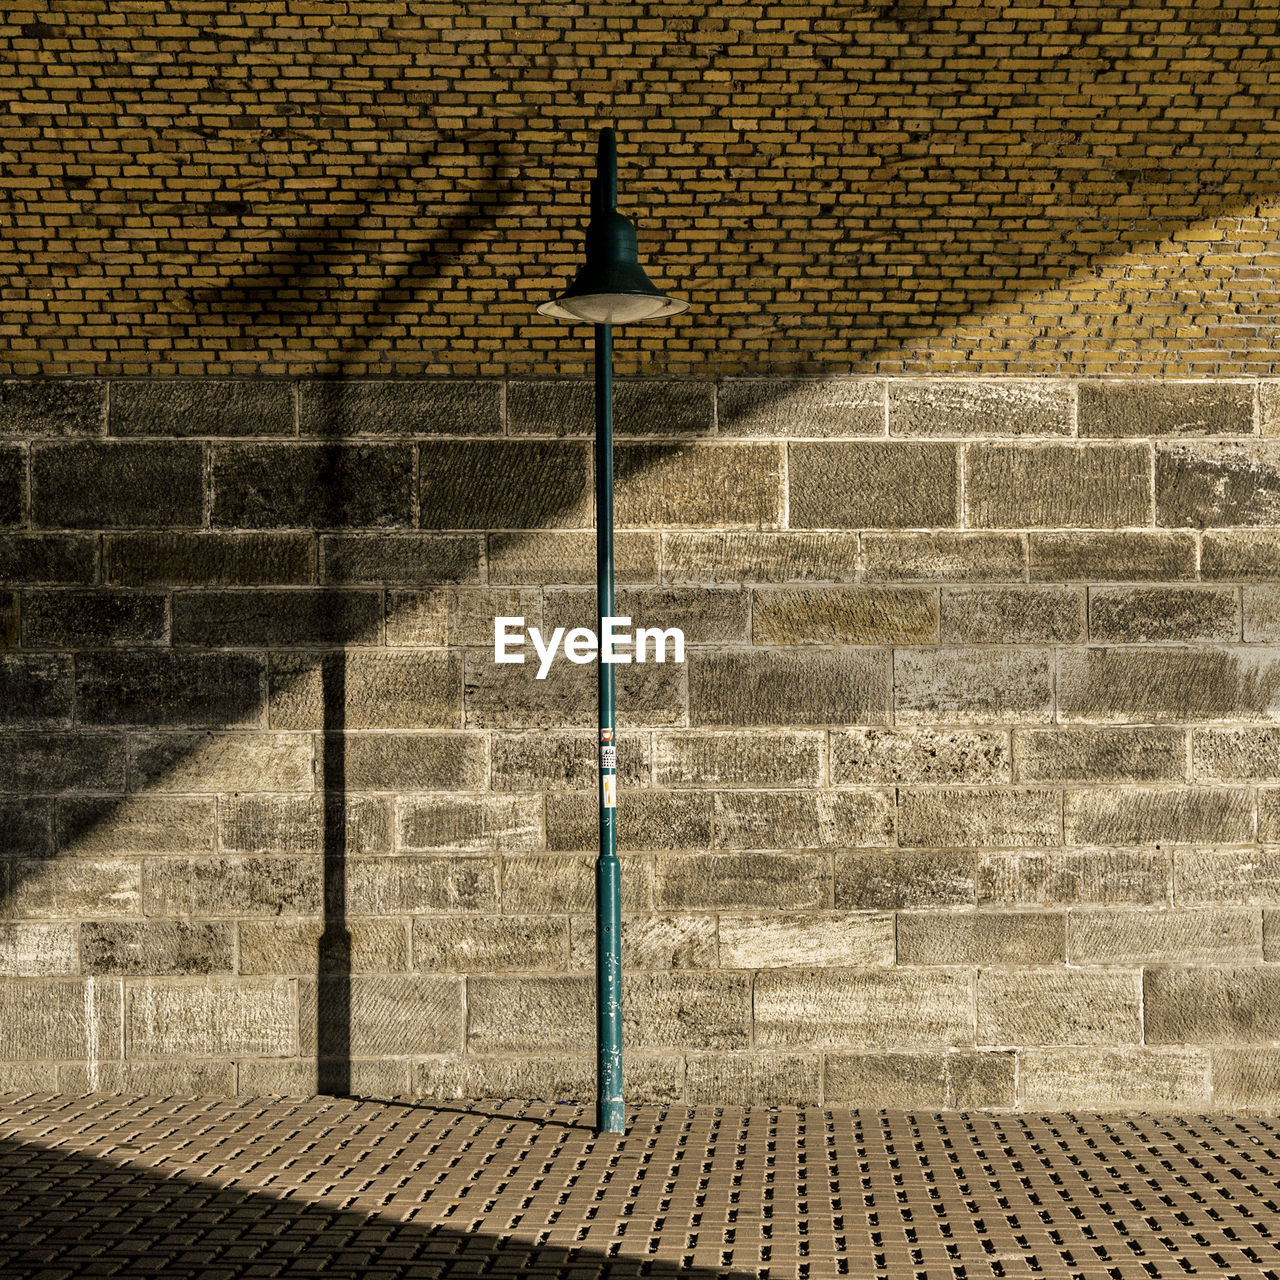 Green street light on sidewalk against brick wall